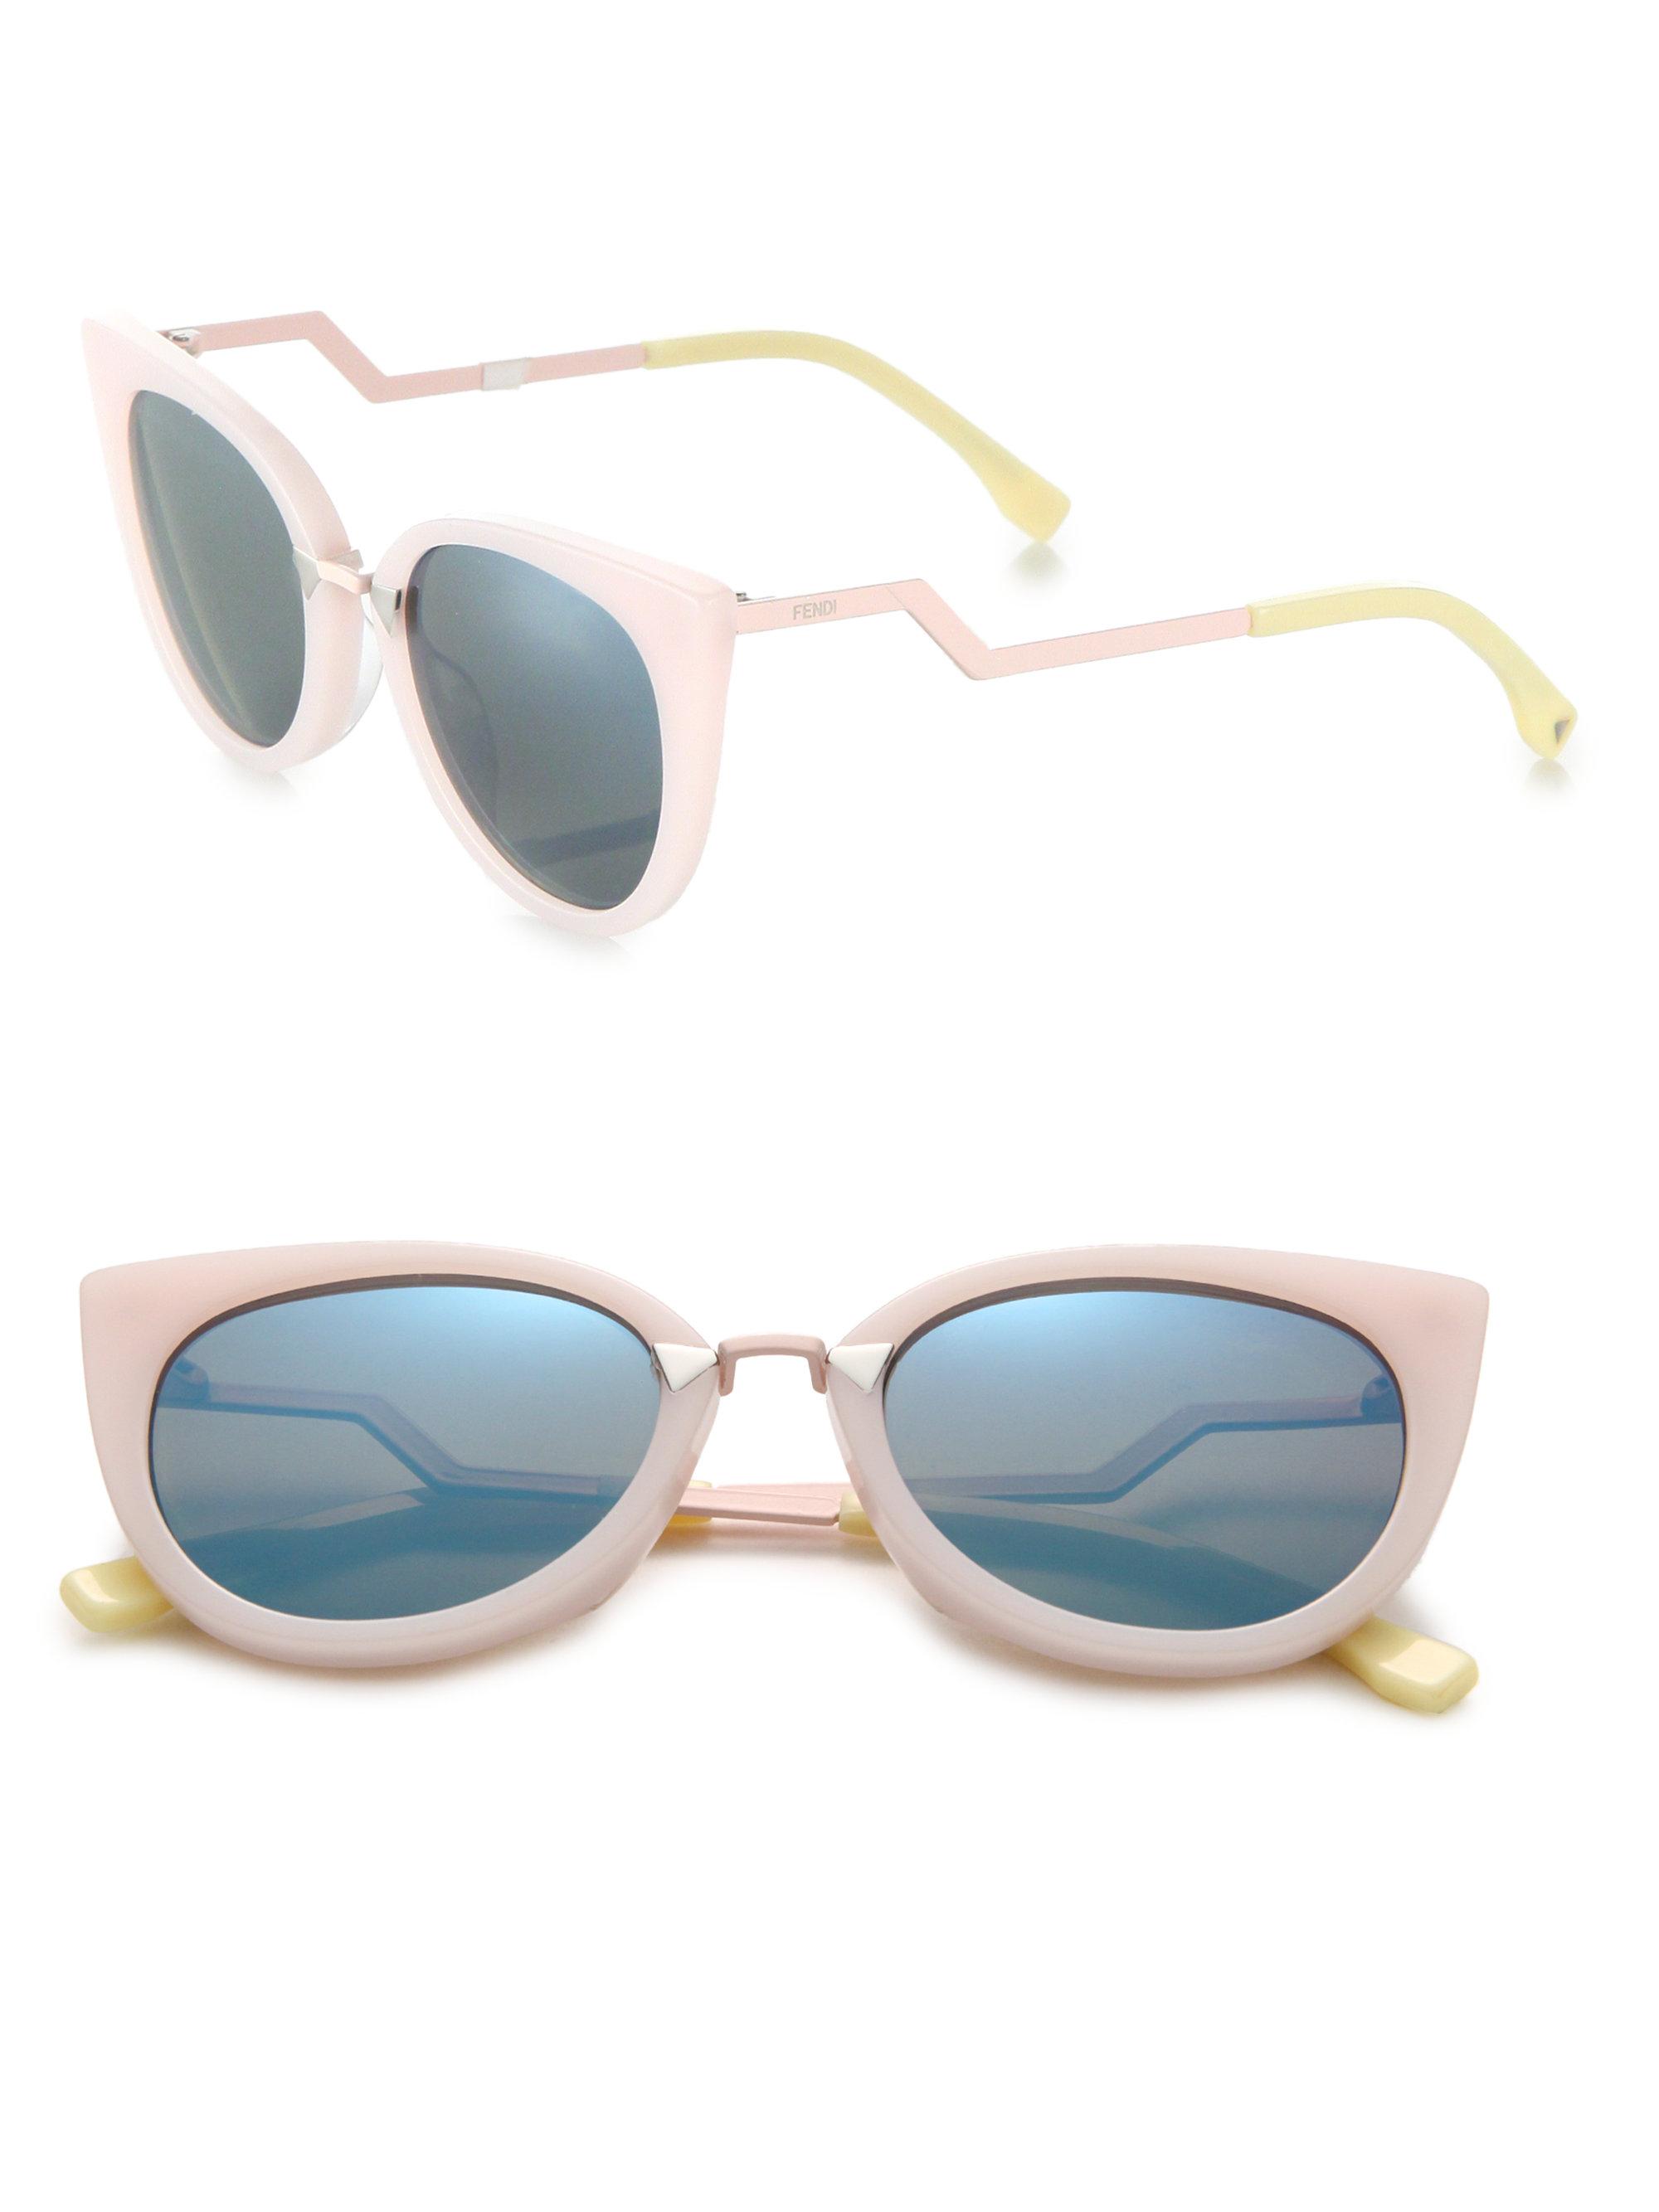 26d389260b95 Fendi Pink Cat Eye Sunglasses - Ontario Active School Travel